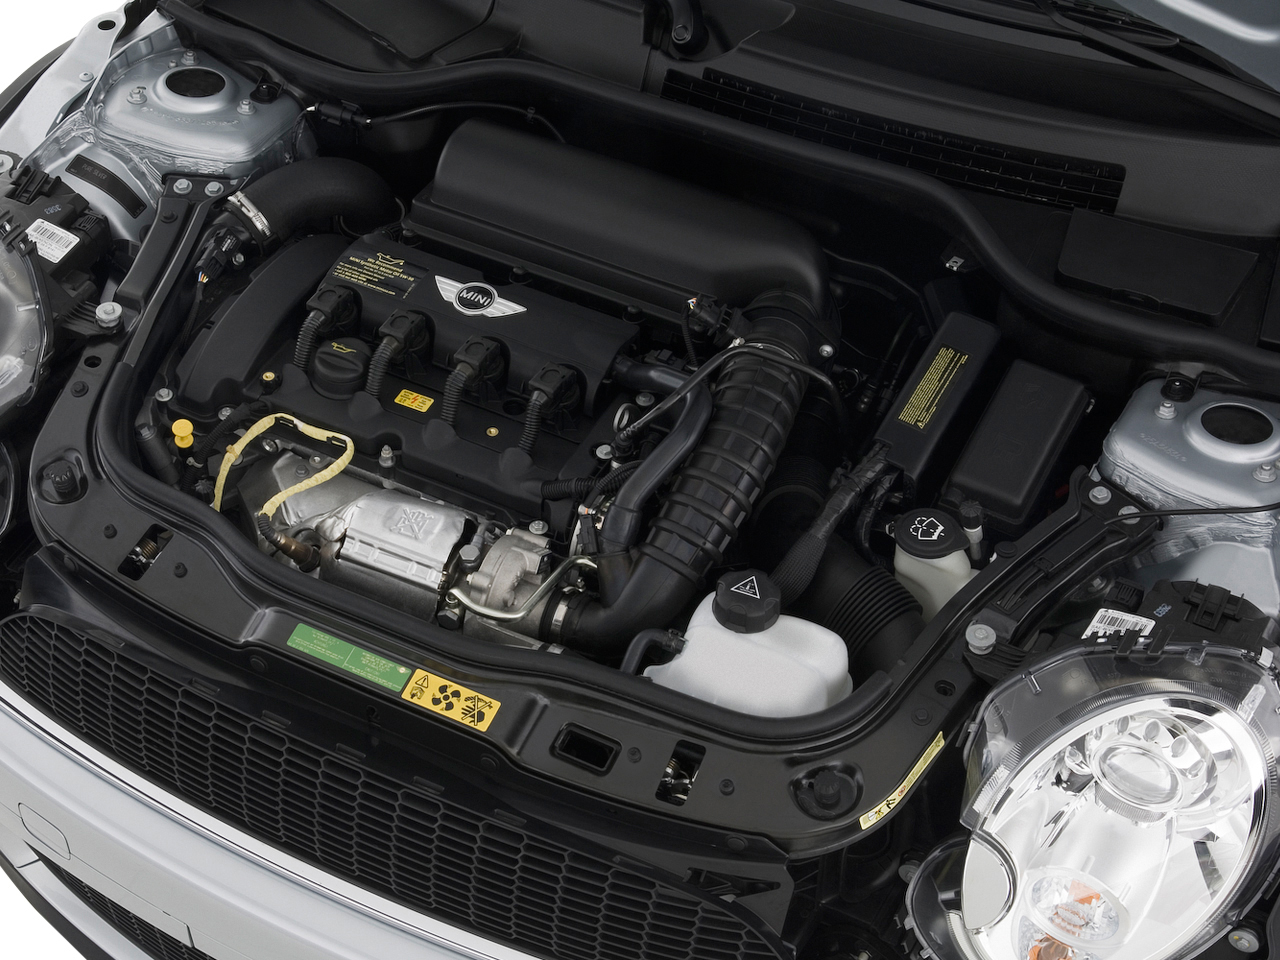 2009 Mini Cooper S Clubman - Mini Compact Hatchback Review